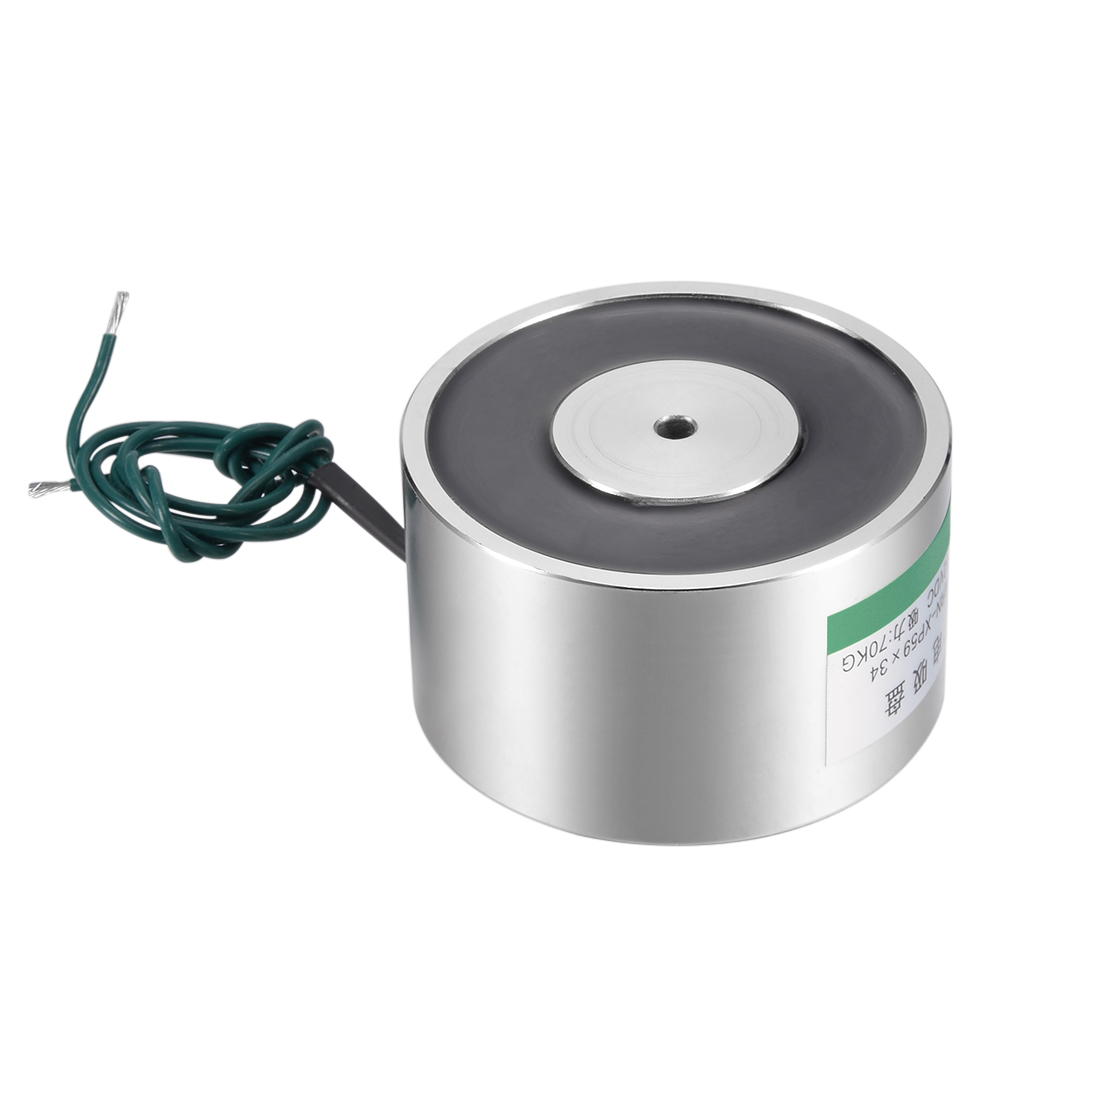 59mm x 34mm DC12V 700N Sucking Disc Solenoid Lift Holding Electromagnet